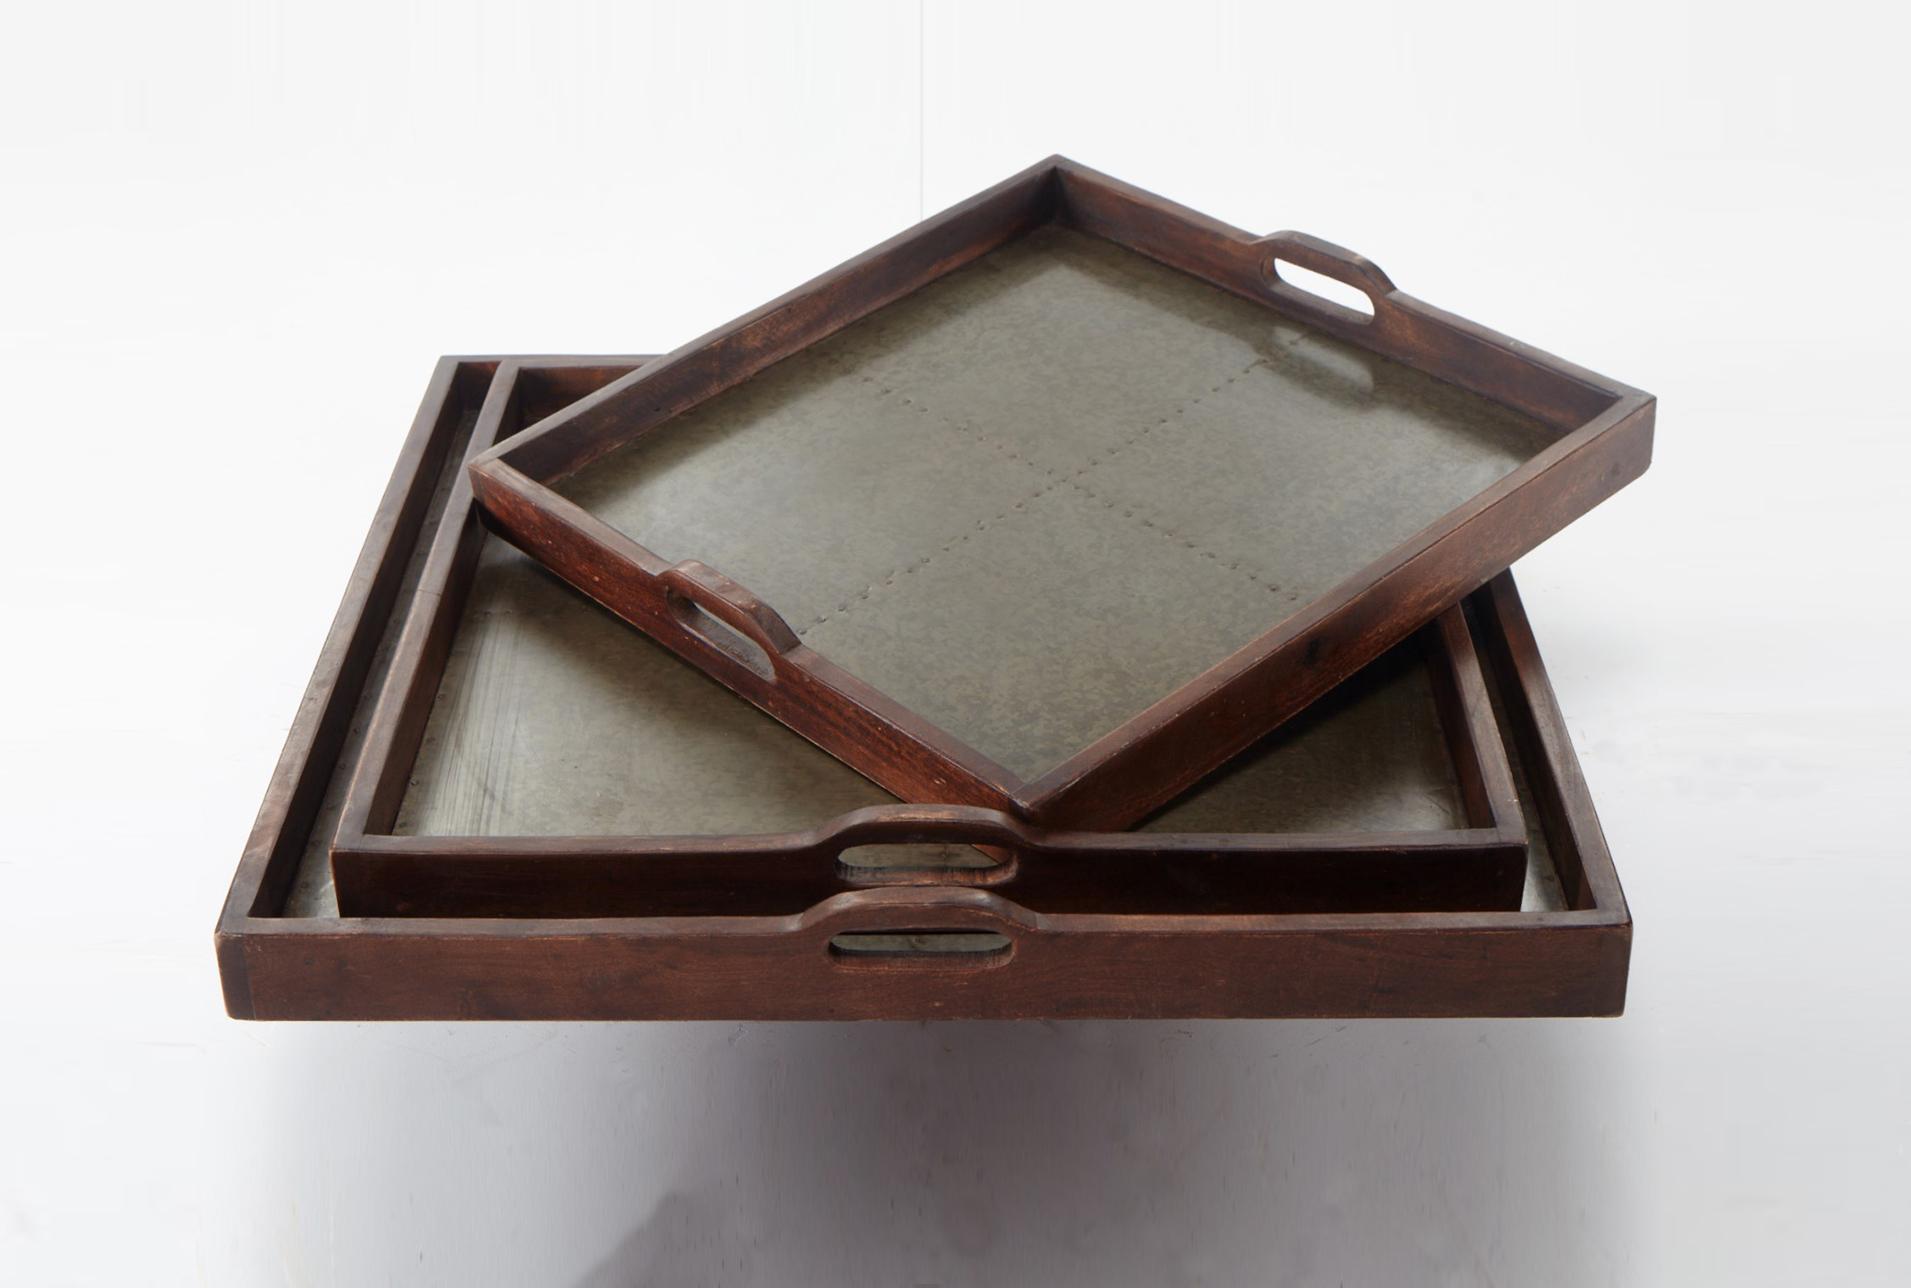 3 Piece Set Honey Finish Vintage Trays